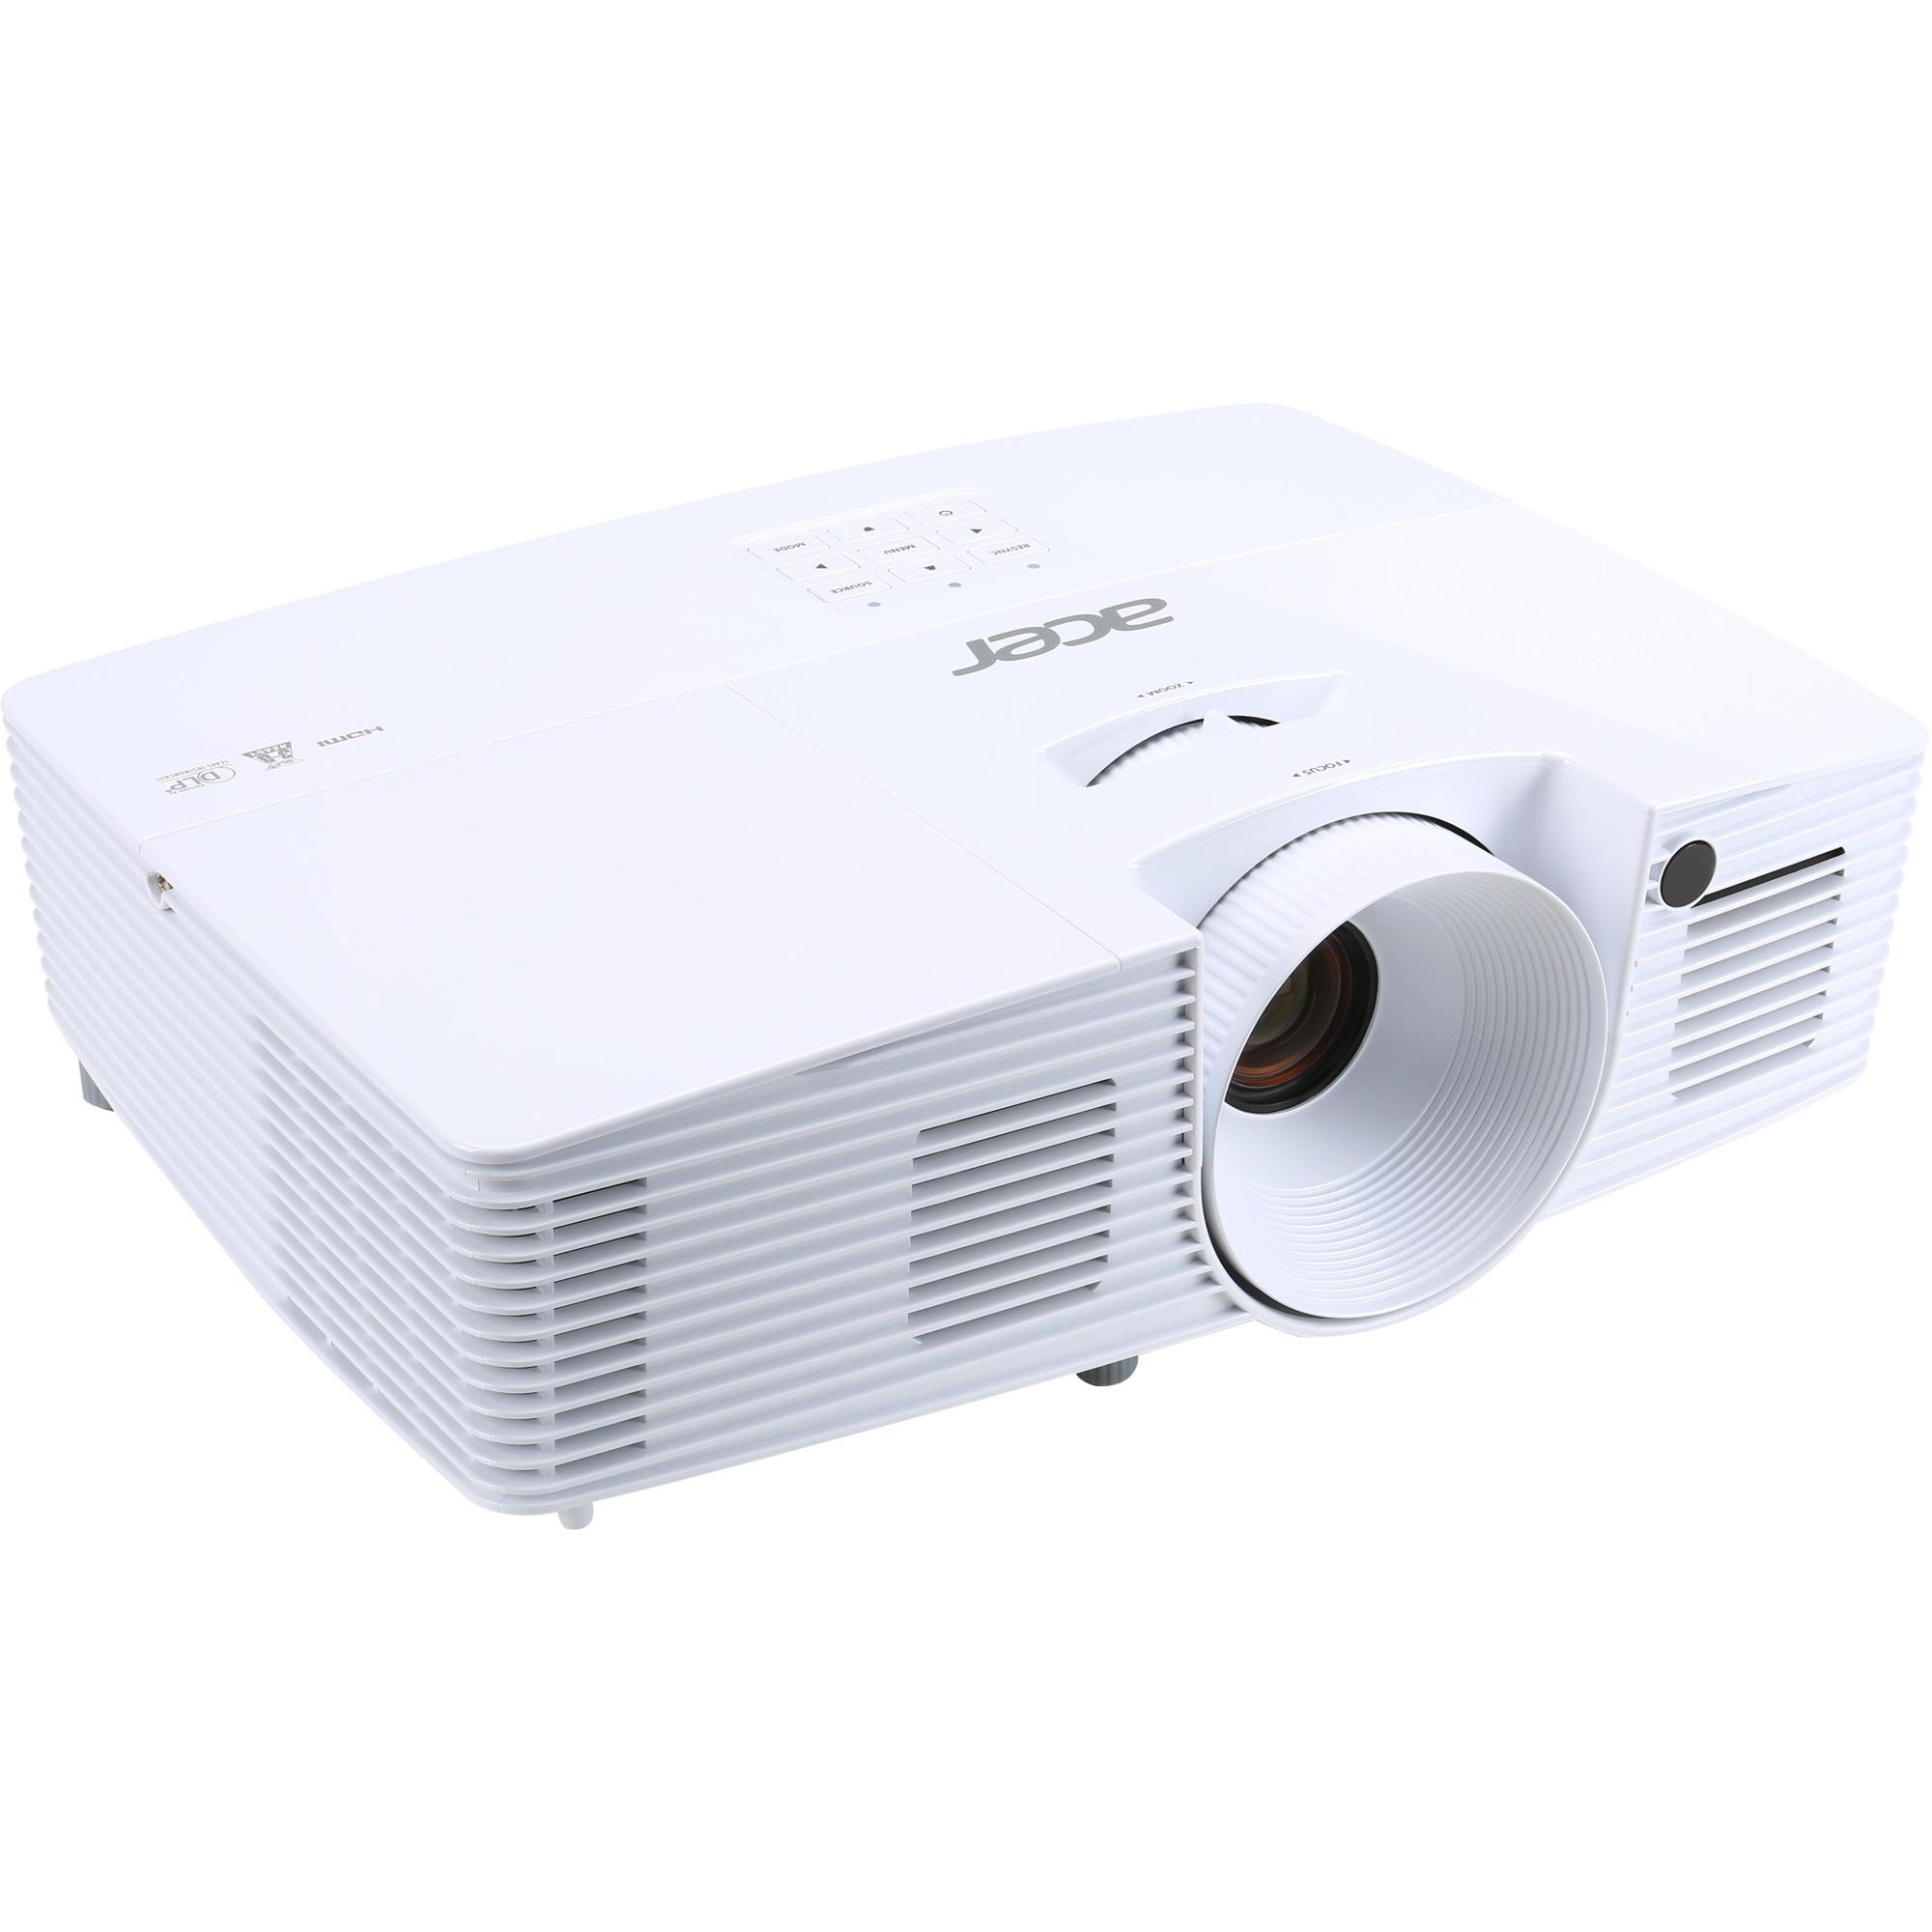 Essential X127H Projecteur de bureau 3600ANSI lumens DLP XGA (1024x768) Blanc vidéo-projecteur, Projecteur DLP